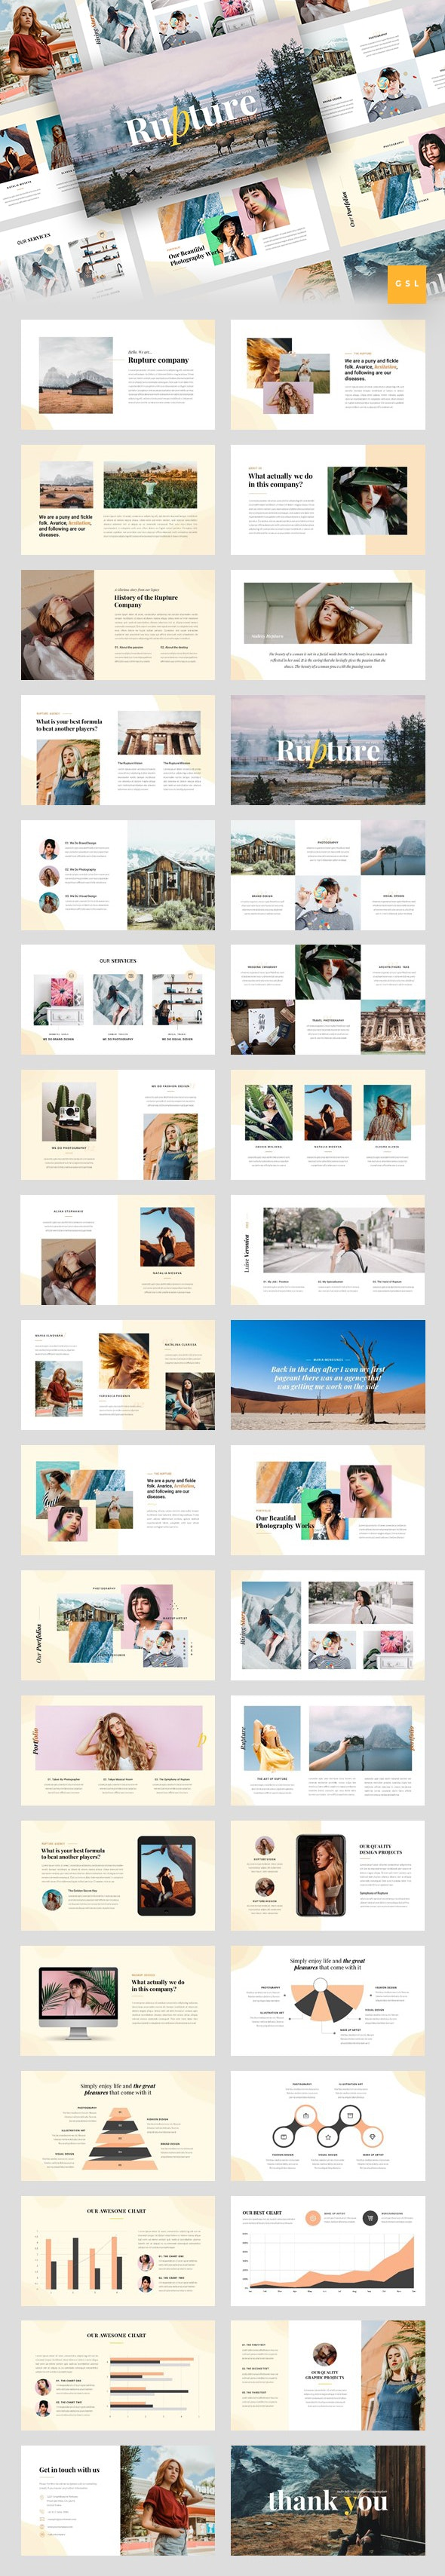 Rupture - Folk Style Agency Google Slides Template - Google Slides Presentation Templates